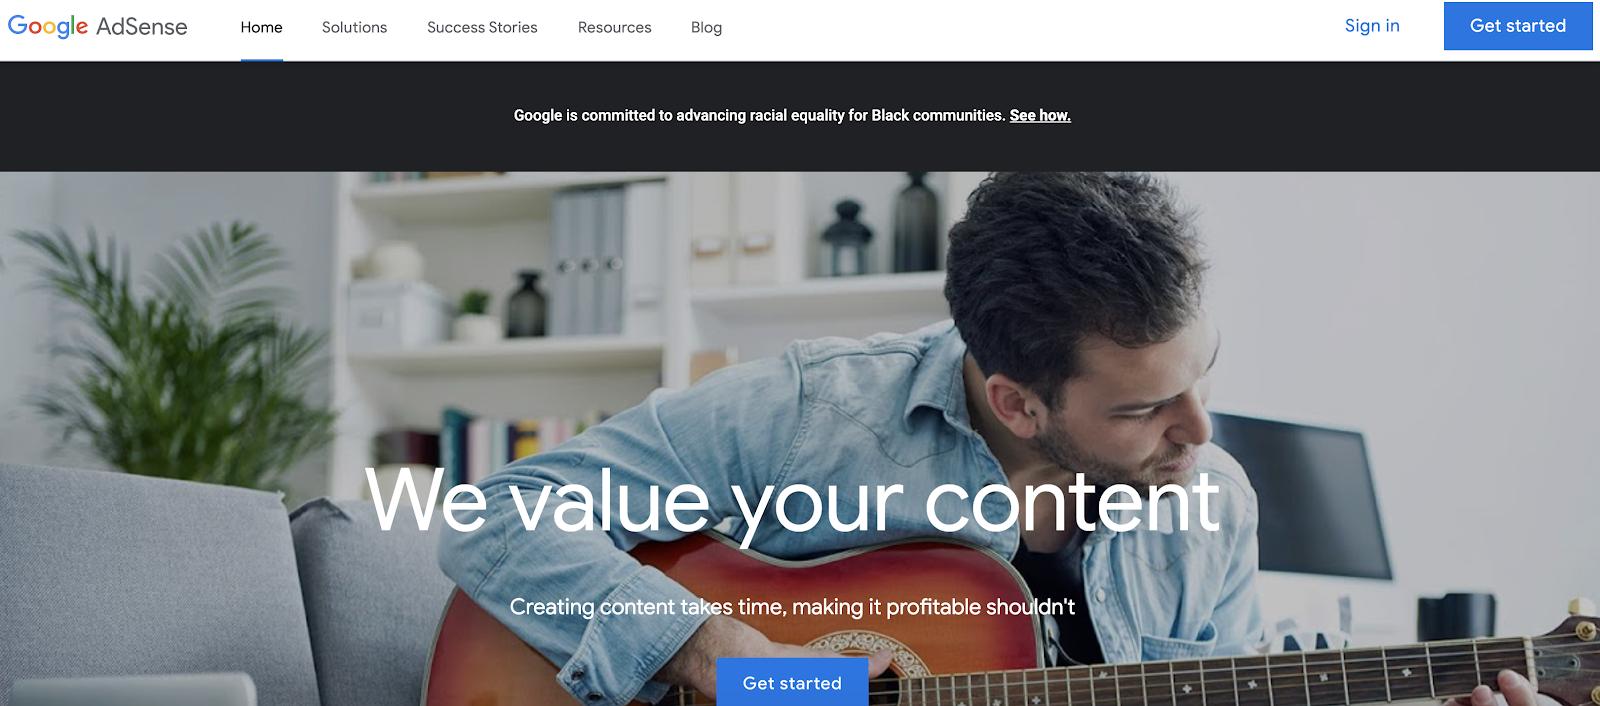 Google AdSense Sign up Page (Screenshot)